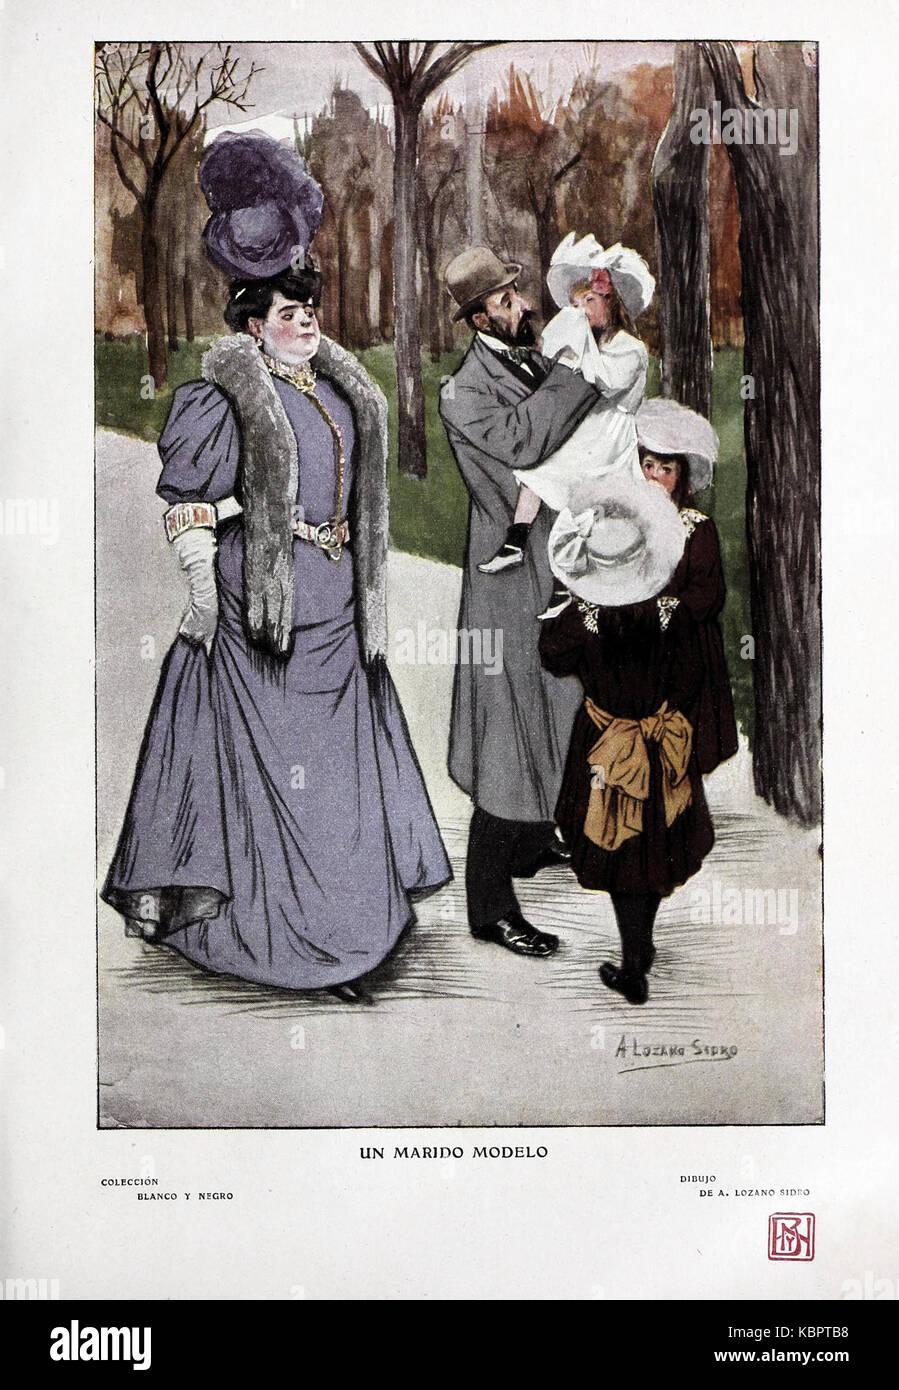 Onu modelo, marido de Lozano Sidro, Blanco y negro, 08 06 1907 Imagen De Stock